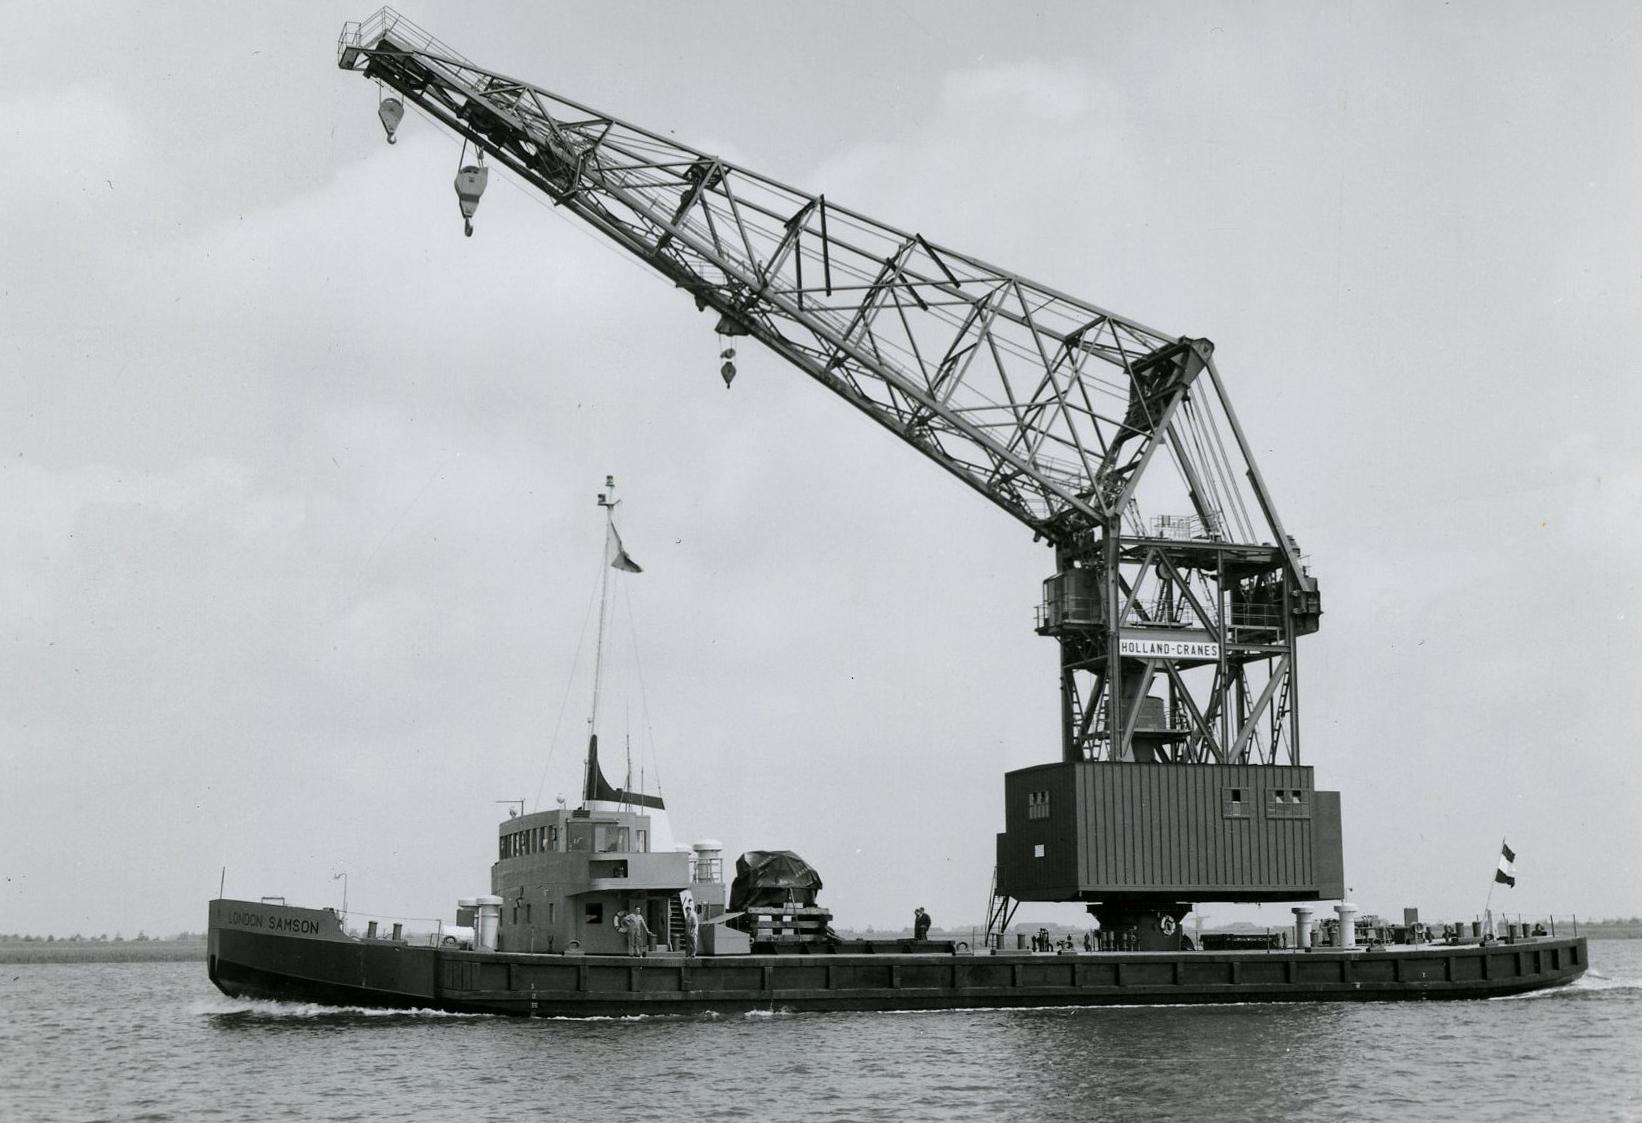 Bnr. 1110: London Samson (1963)